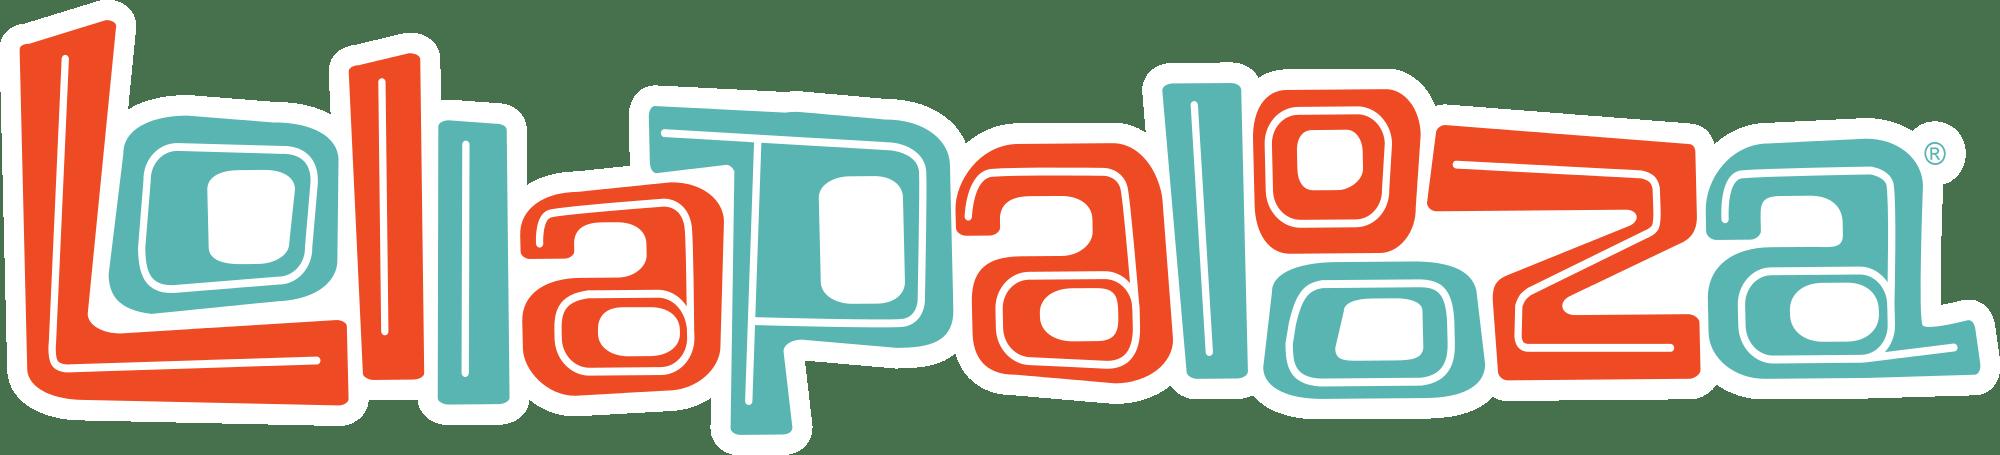 Lollapalooza Logo transparent PNG.